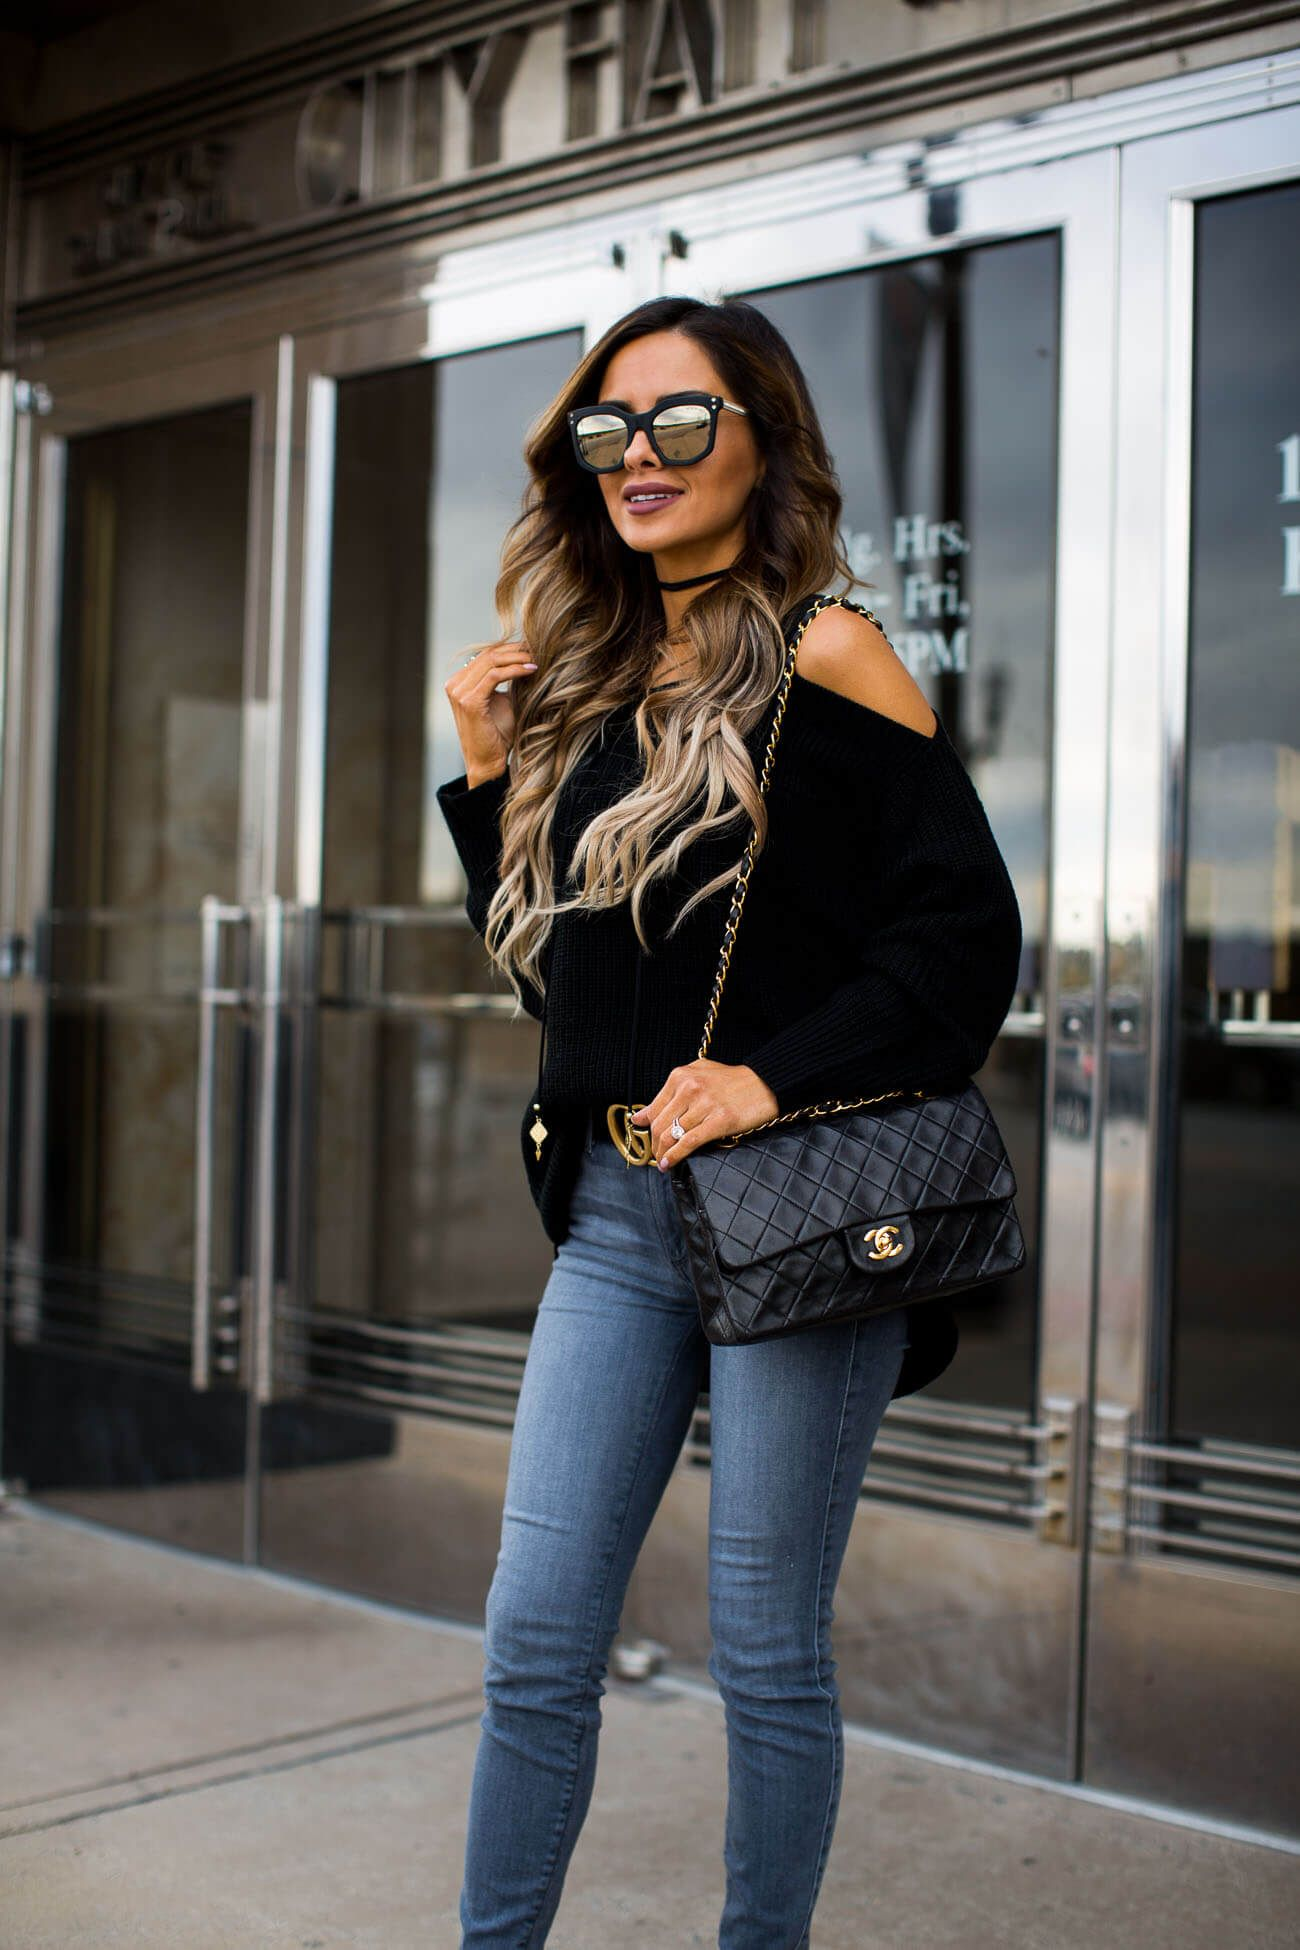 c4965d303b4 fashion blogger mia mia mine wearing mirrored sunglasses from henri bendel  and a chanel bag